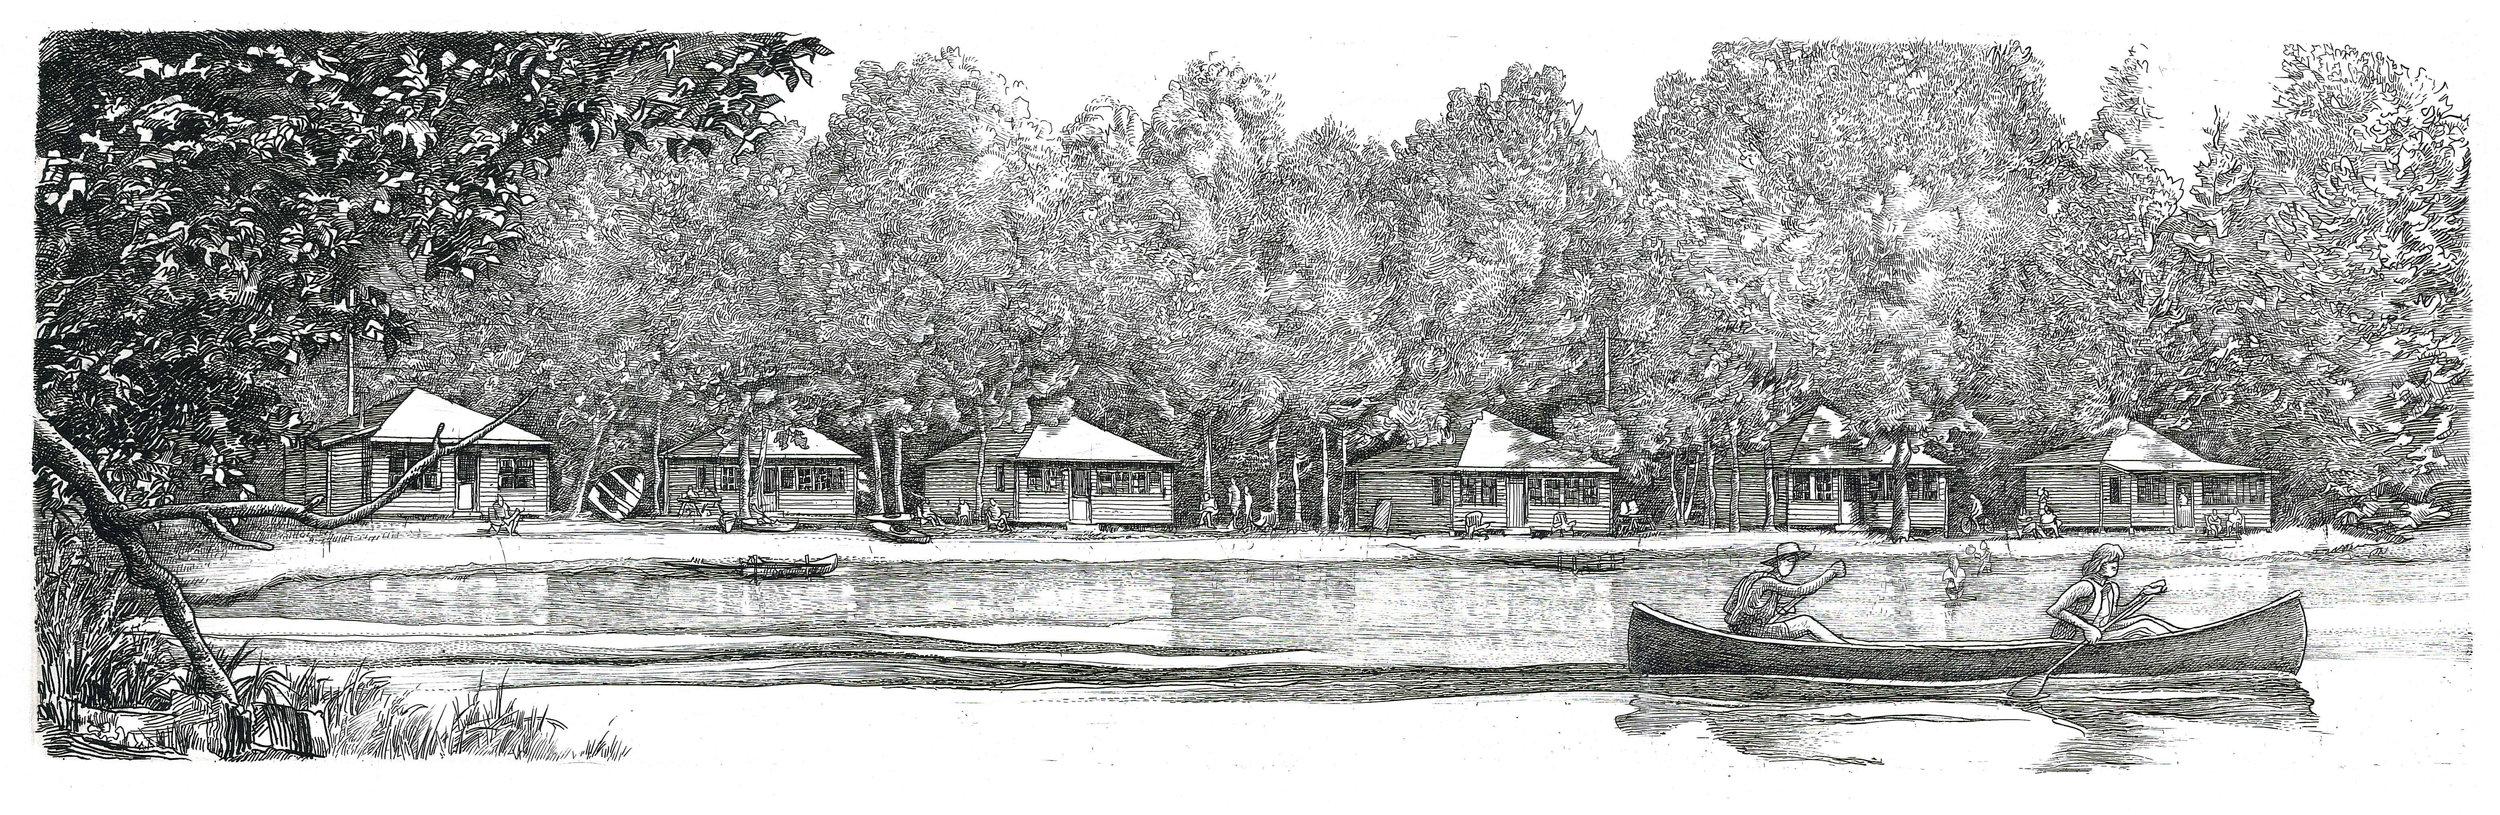 The Little Bay ,Jordan's Cottages (2018)